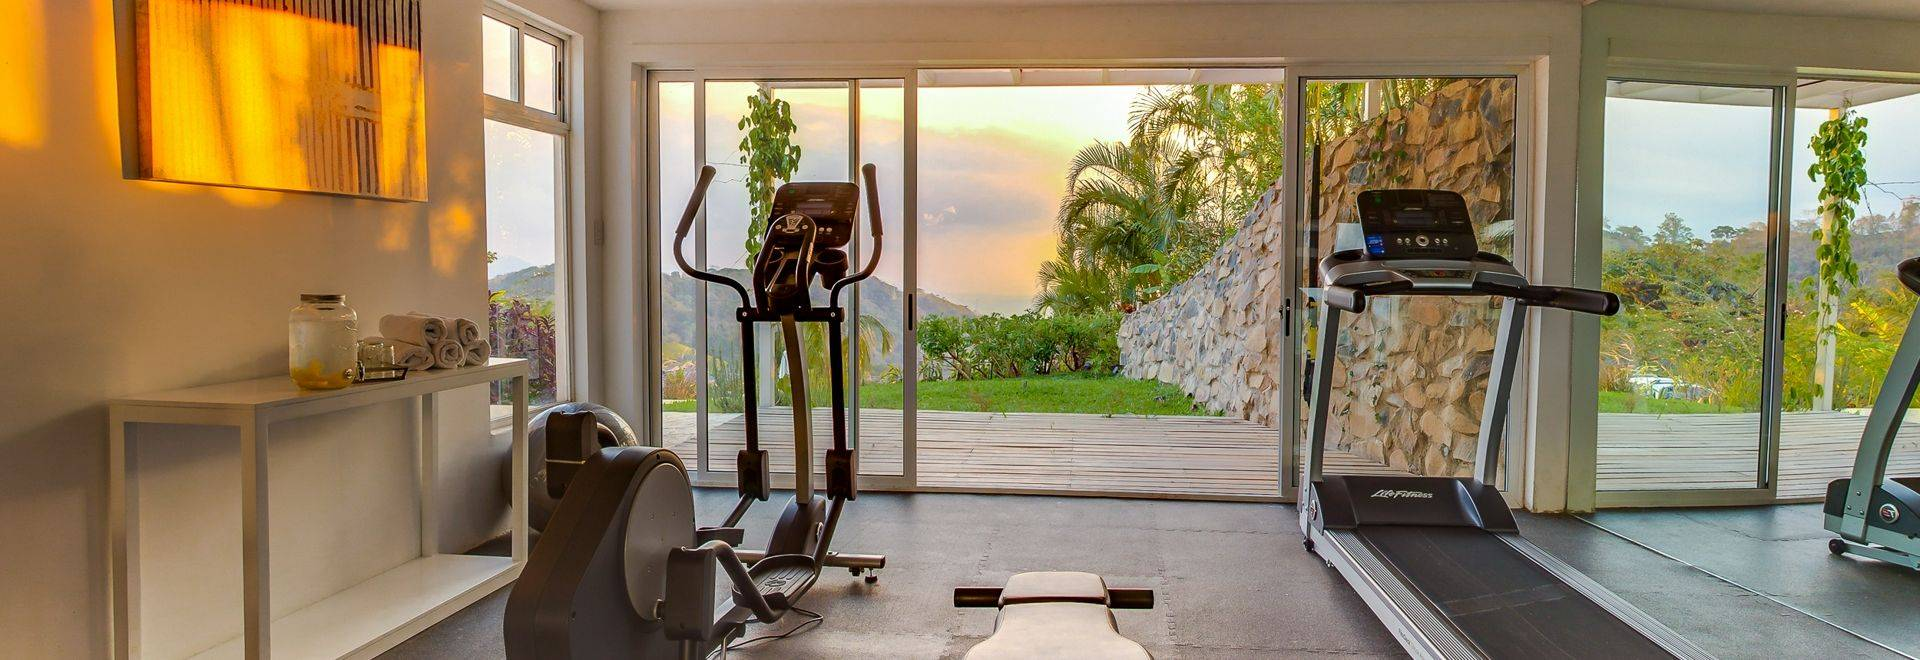 The-Retreat-Costa-Rica-gym.jpg